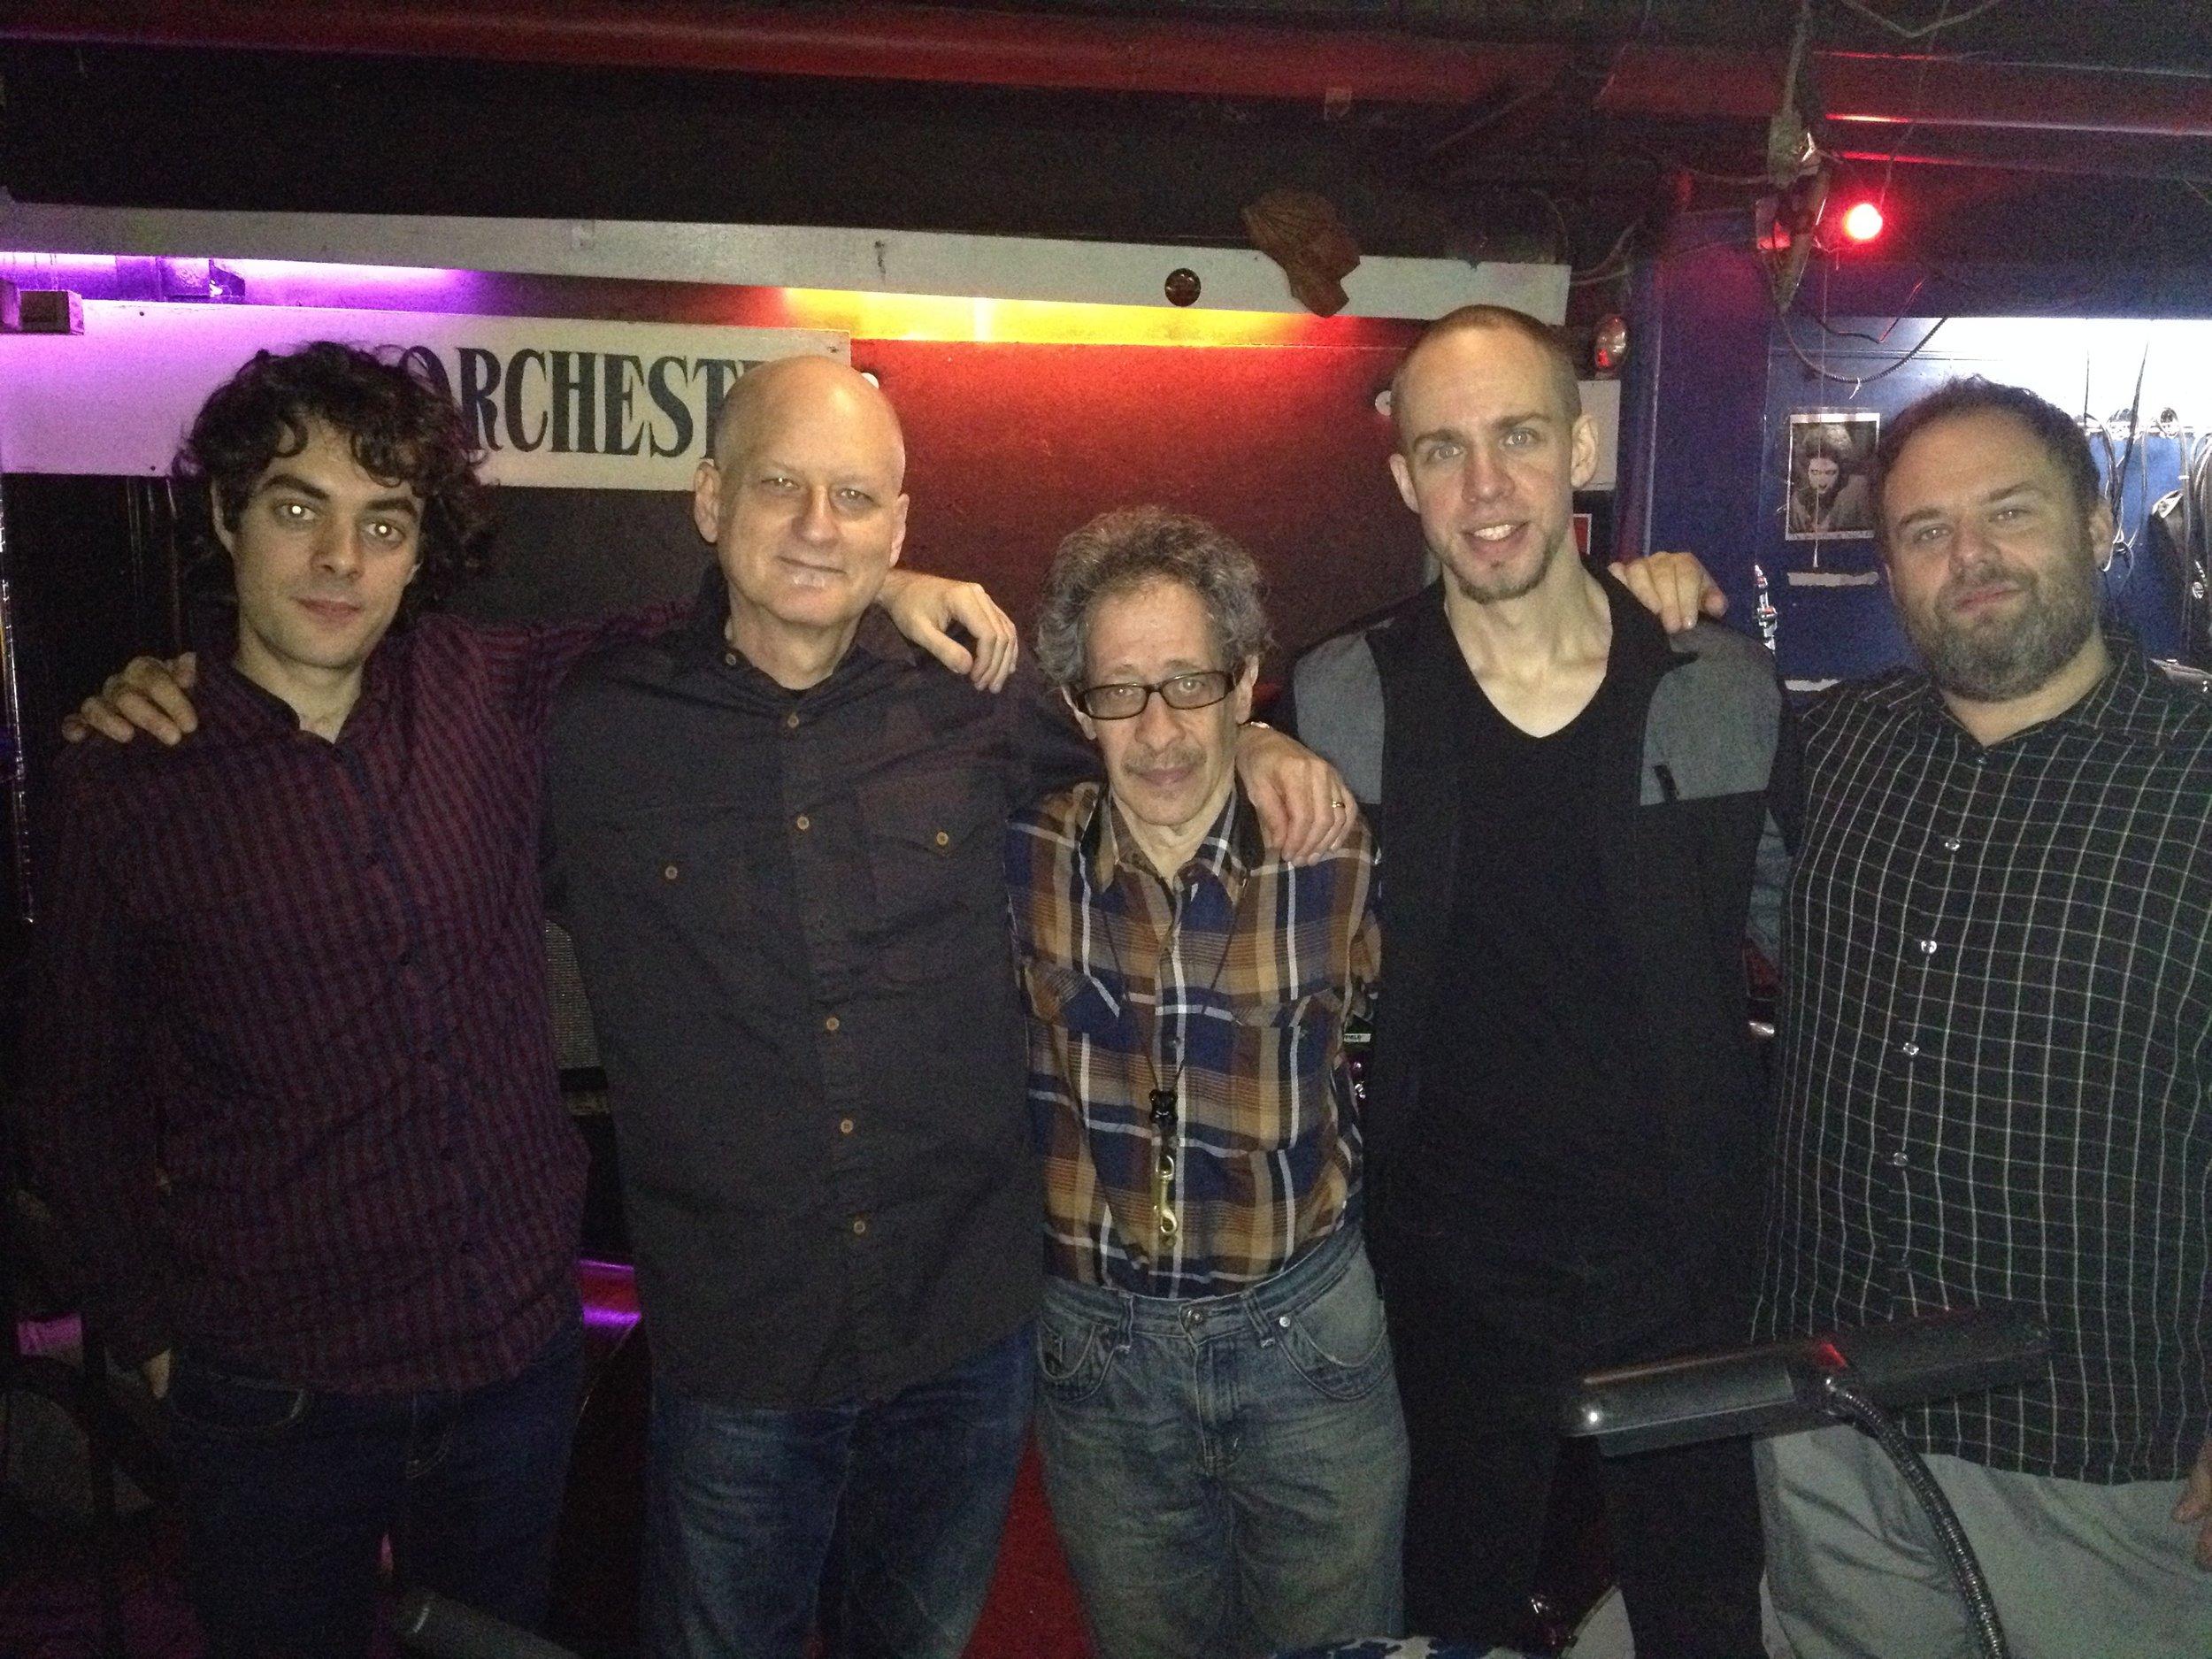 with Dave Schnitter, Greg Glassman, Yago Vasquez, Jeff Hirshfield